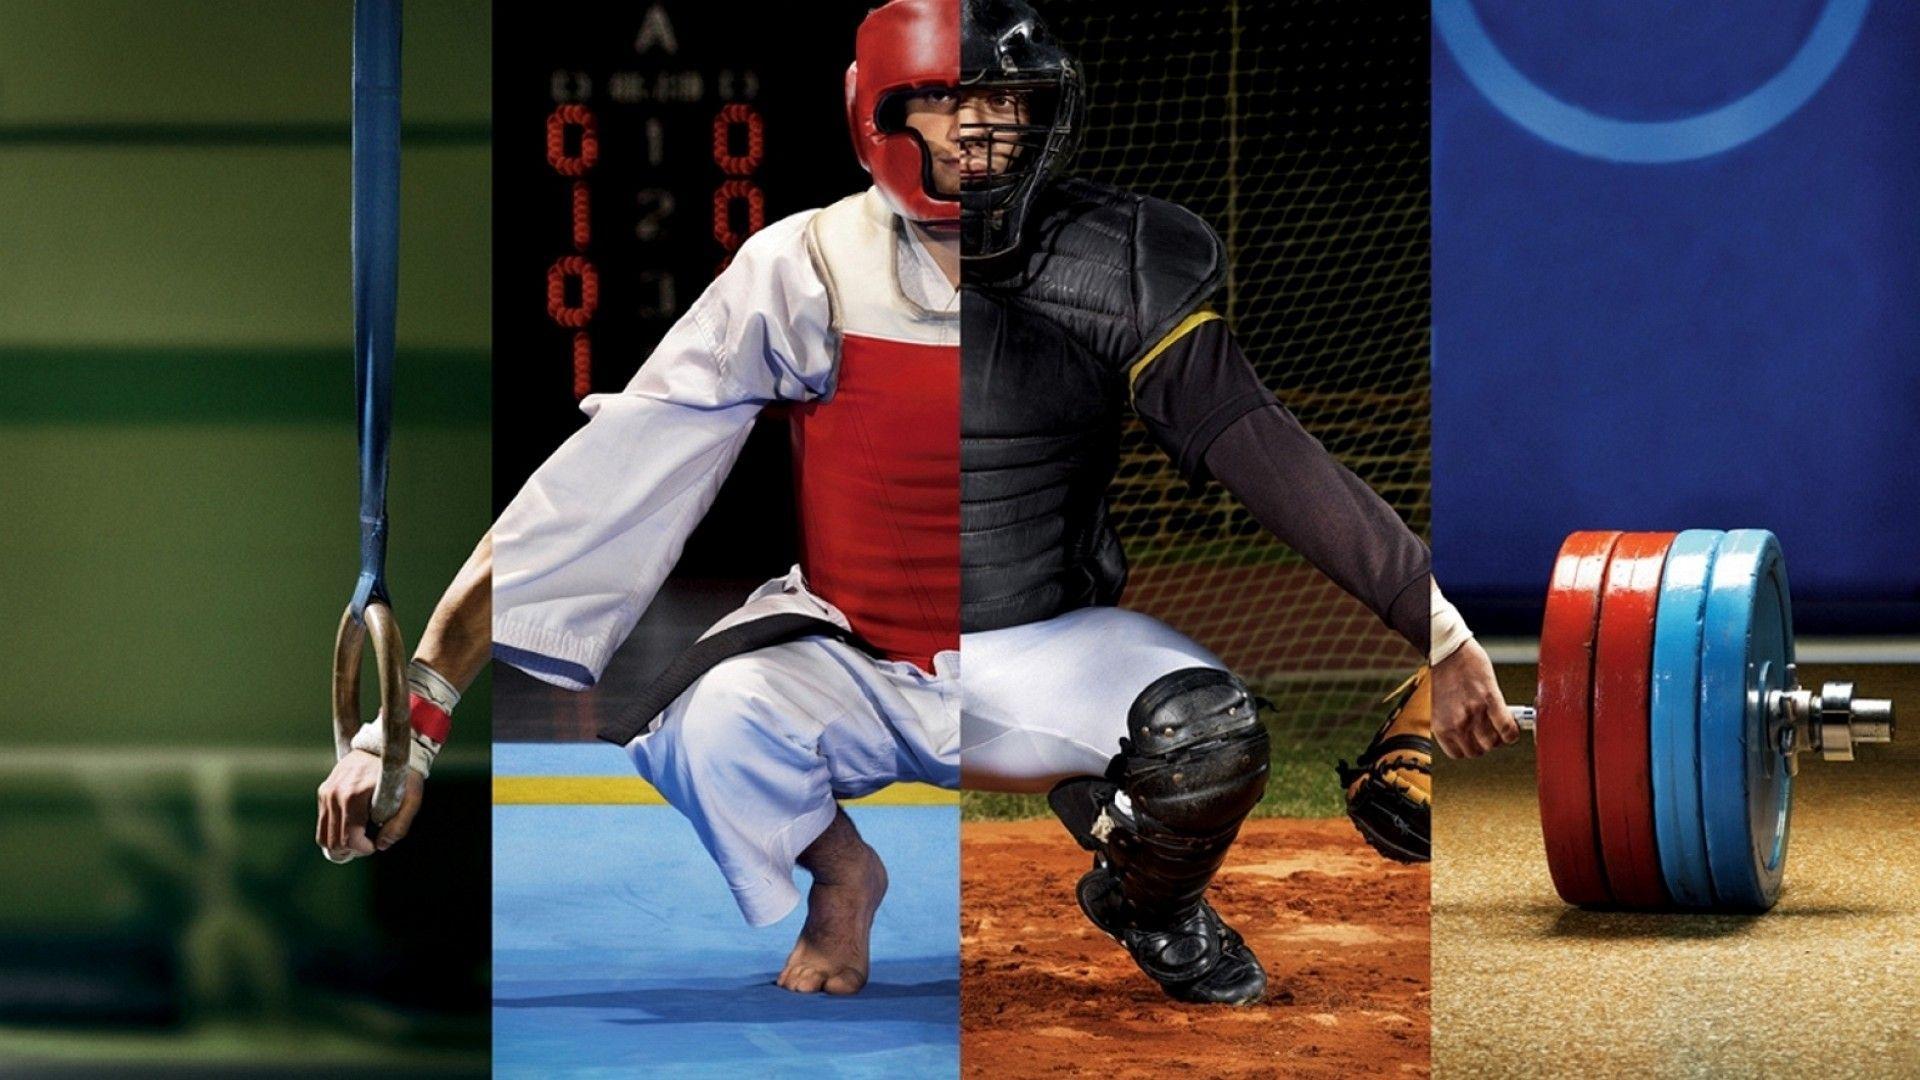 Weightlifting Baseball Beautiful HD Pics HQ Backgrounds 1920x1080